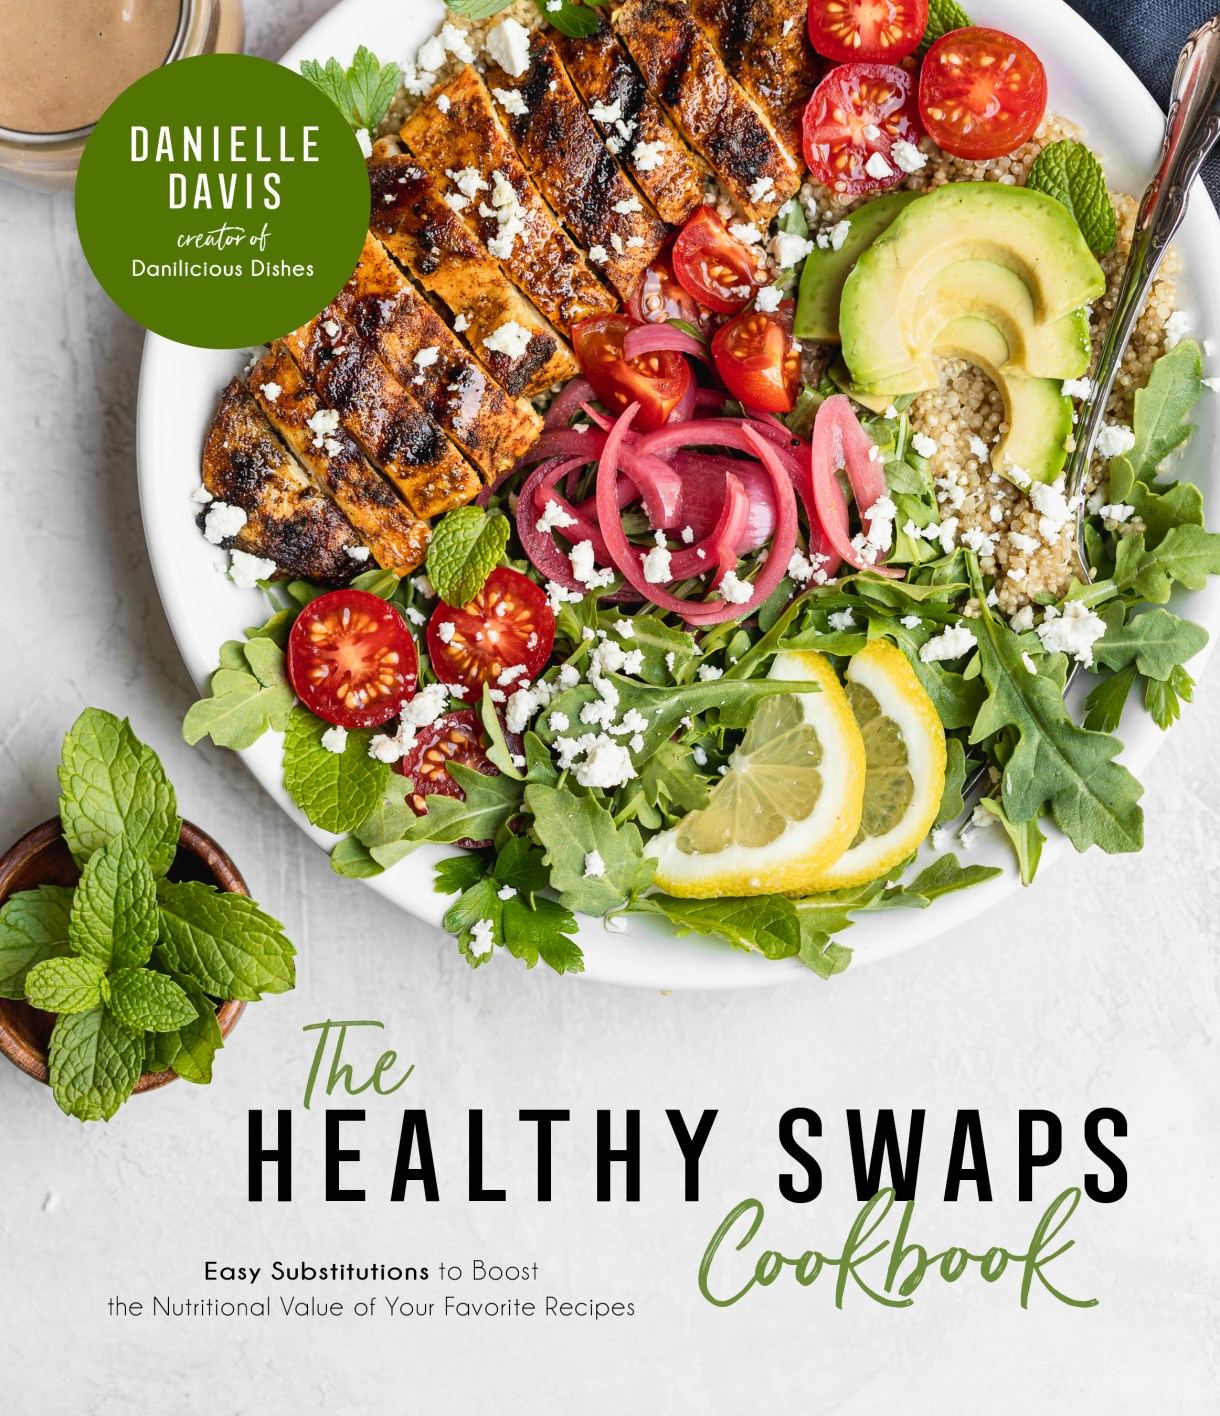 healthy swaps cookbook cover